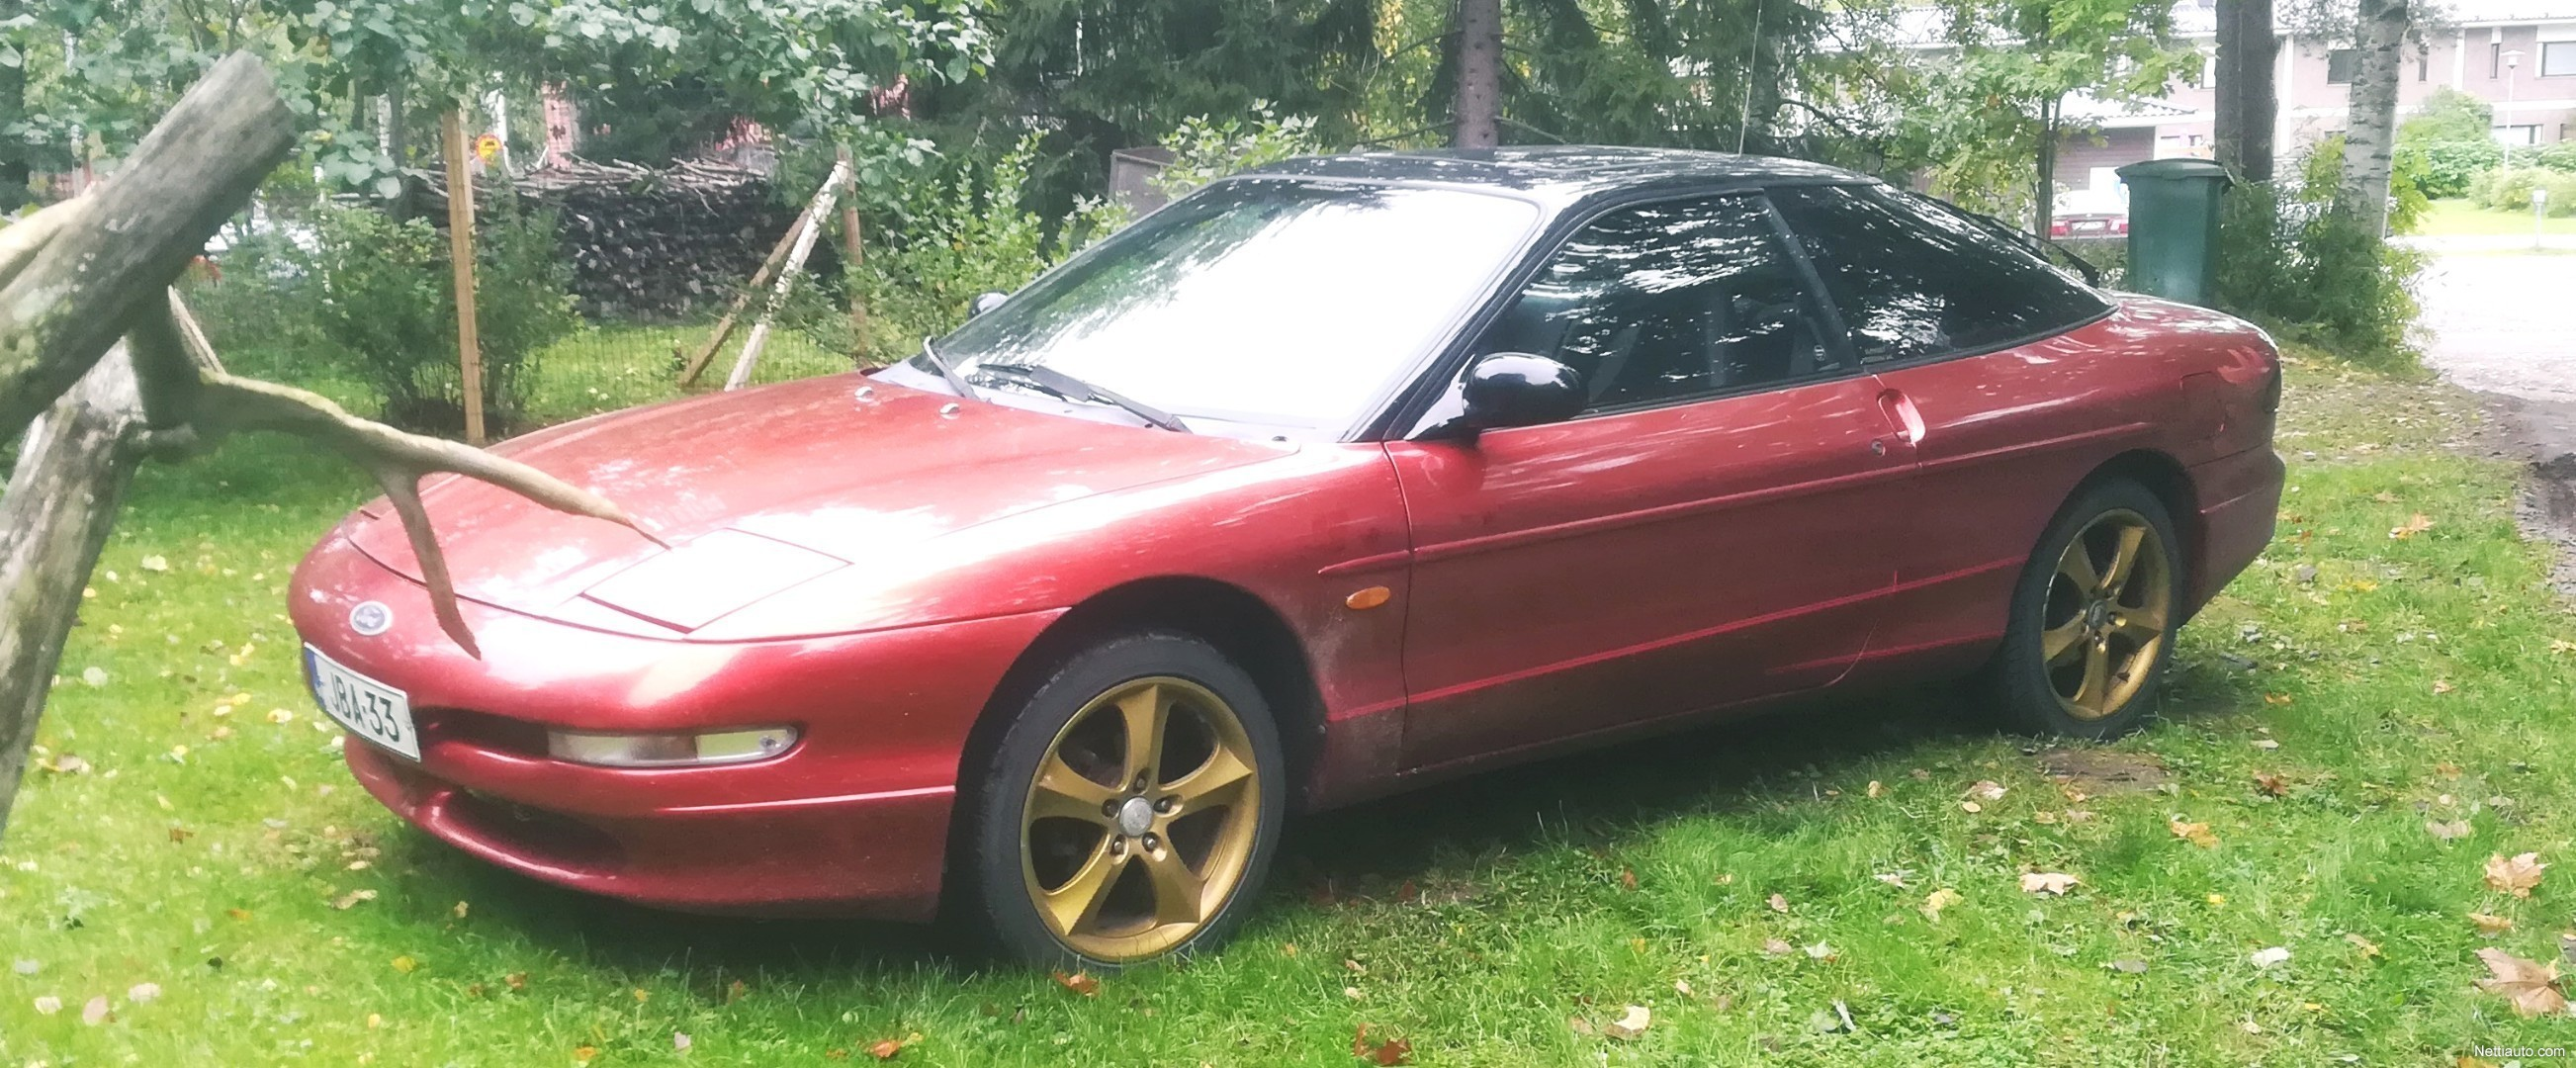 Enlarge image. Ford Probe